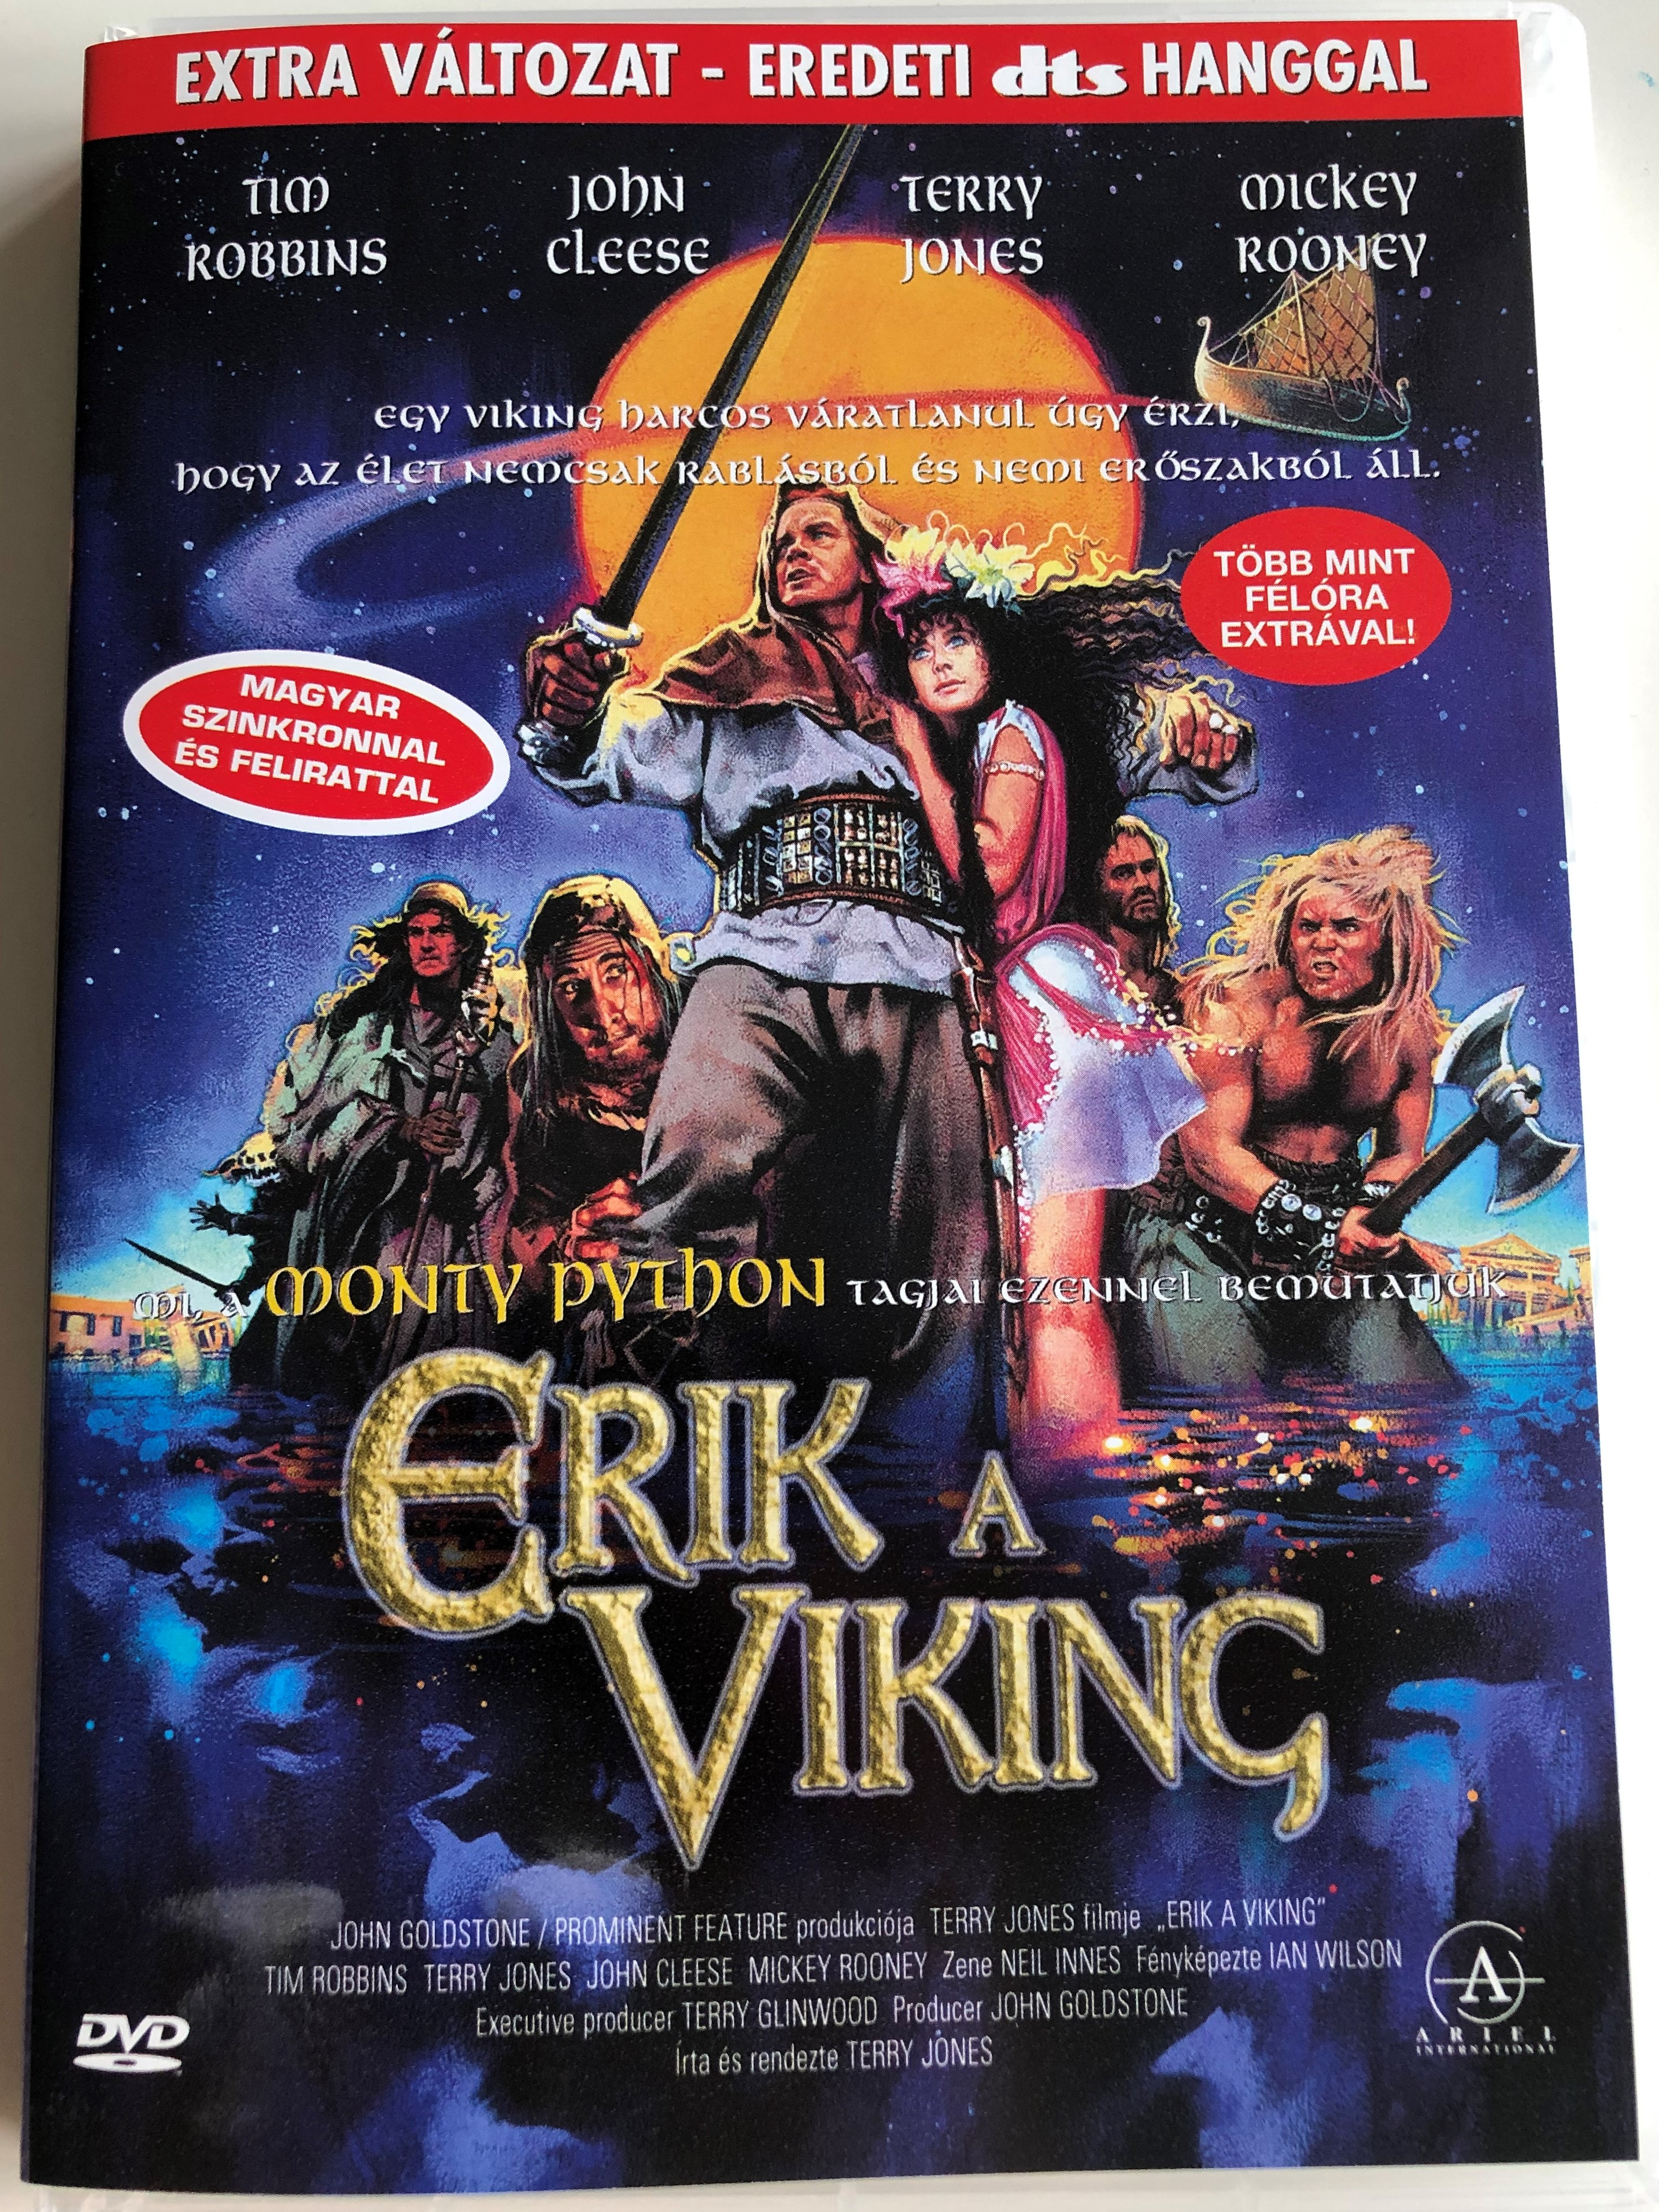 erik-the-viking-dvd-1989-erik-a-viking-directed-by-terry-jones-starring-tim-robbins-terry-jones-eartha-kitt-mickey-rooney-tsutomu-sekine-john-cleese-antony-sher-imogen-stubbs-1-.jpg